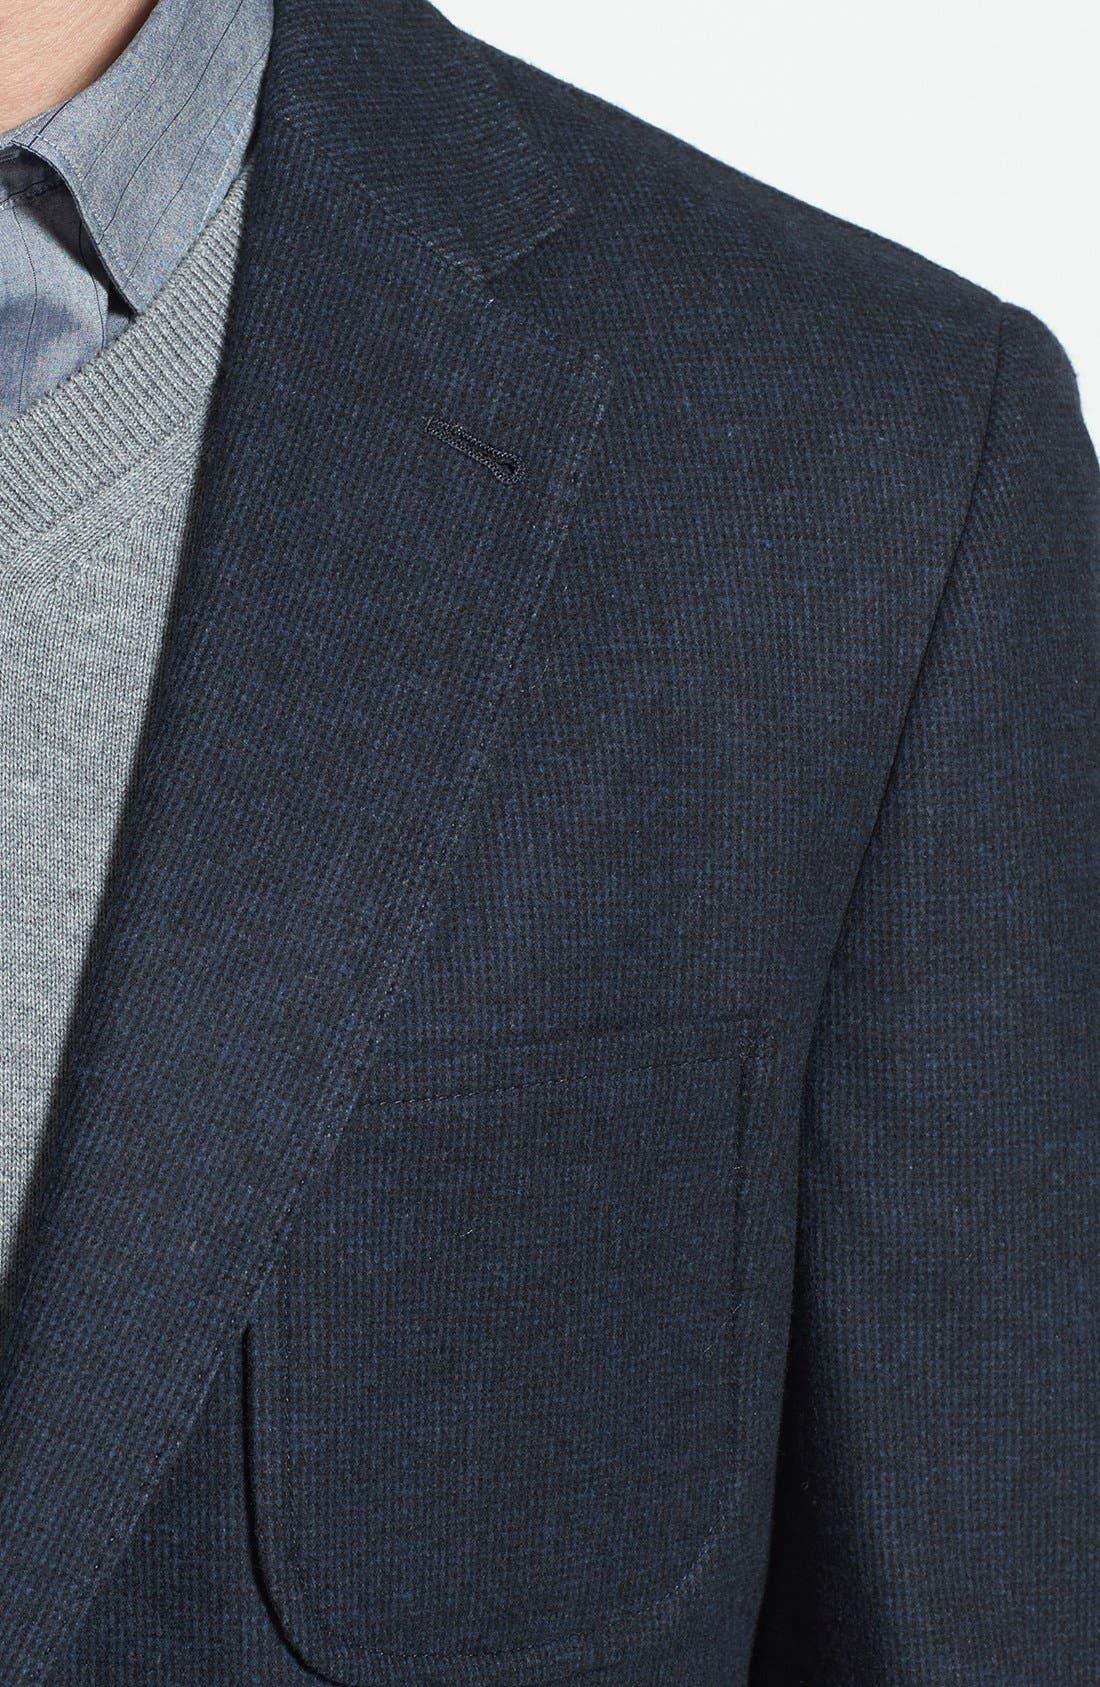 Alternate Image 3  - Kroon Wool Blend Sportcoat